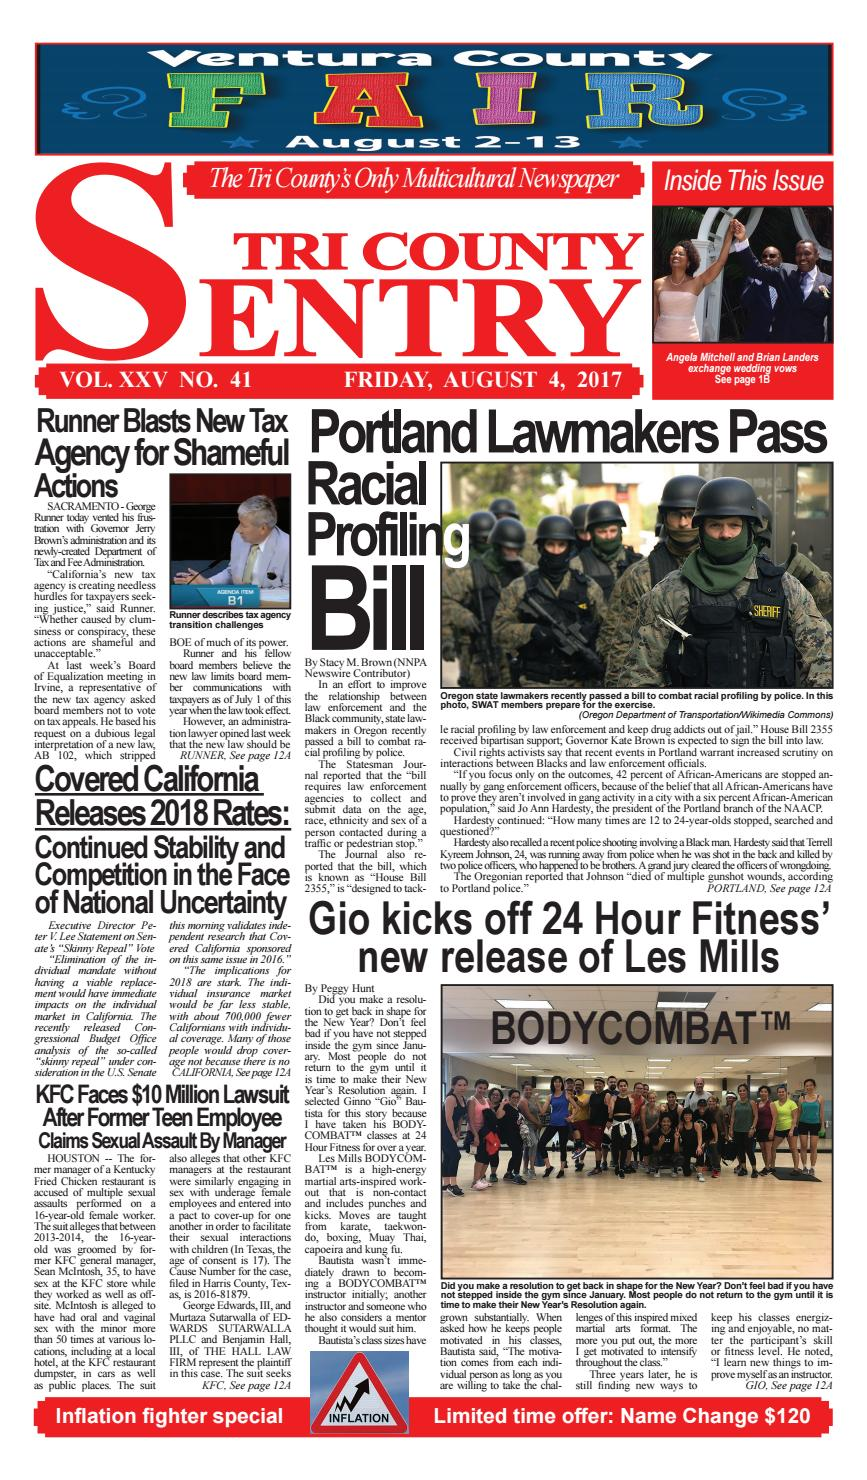 fb2b30cbb7a9f3 Tri County Sentry by Tri County Sentry - issuu